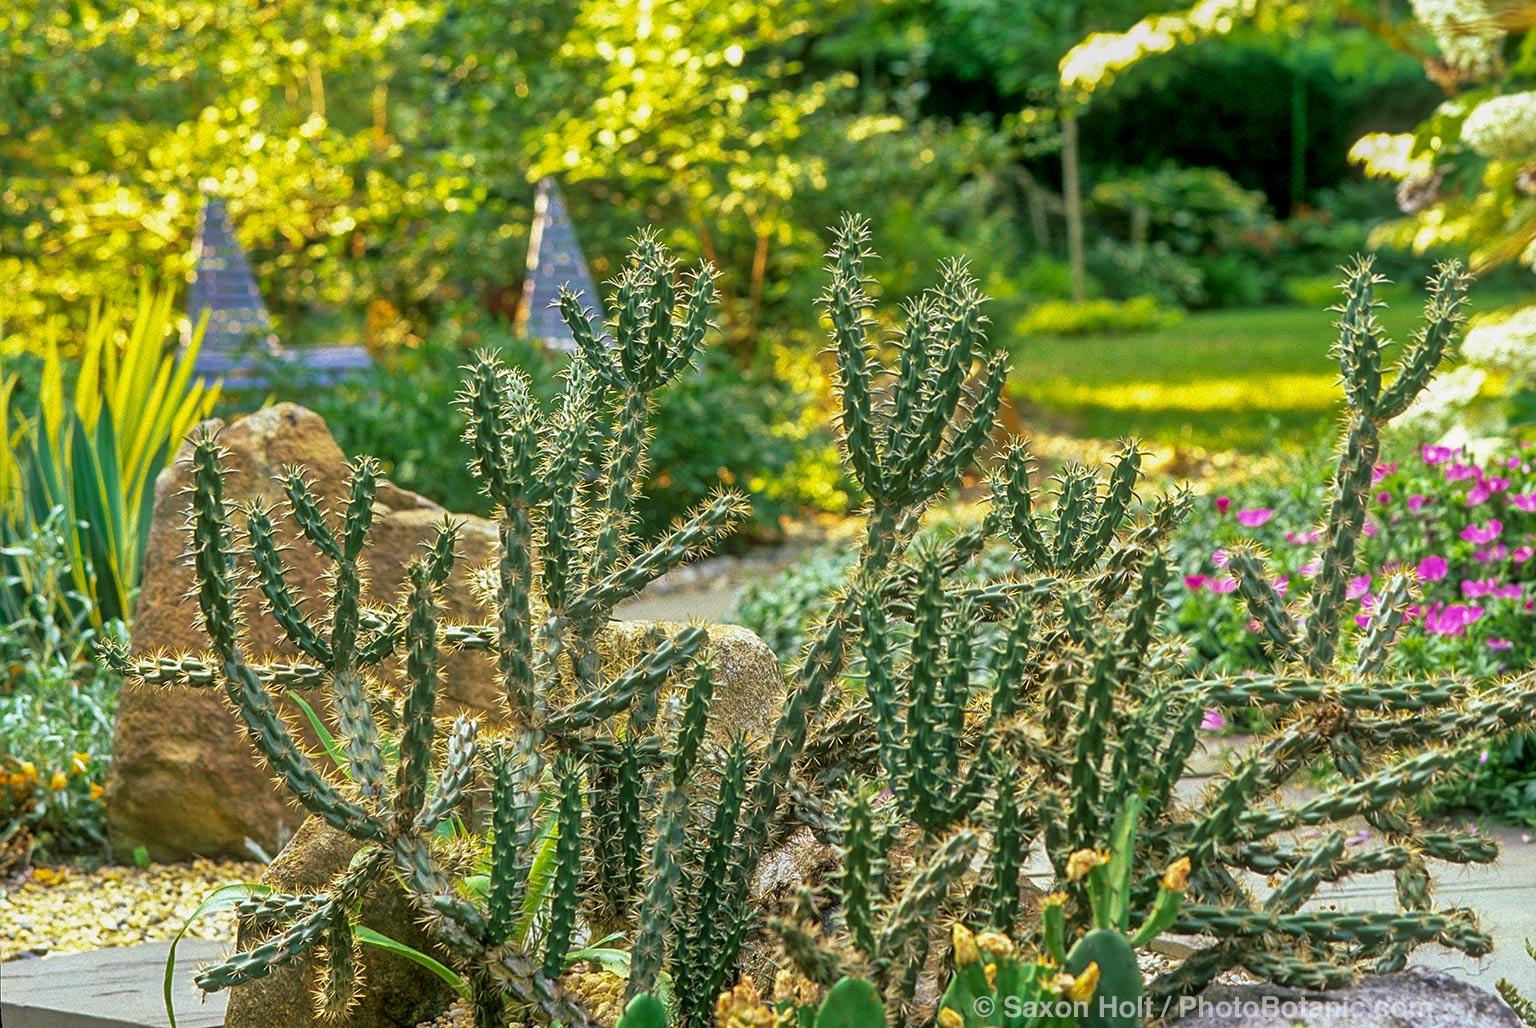 Hardy cactus Opuntia imbricata in Delaware garden